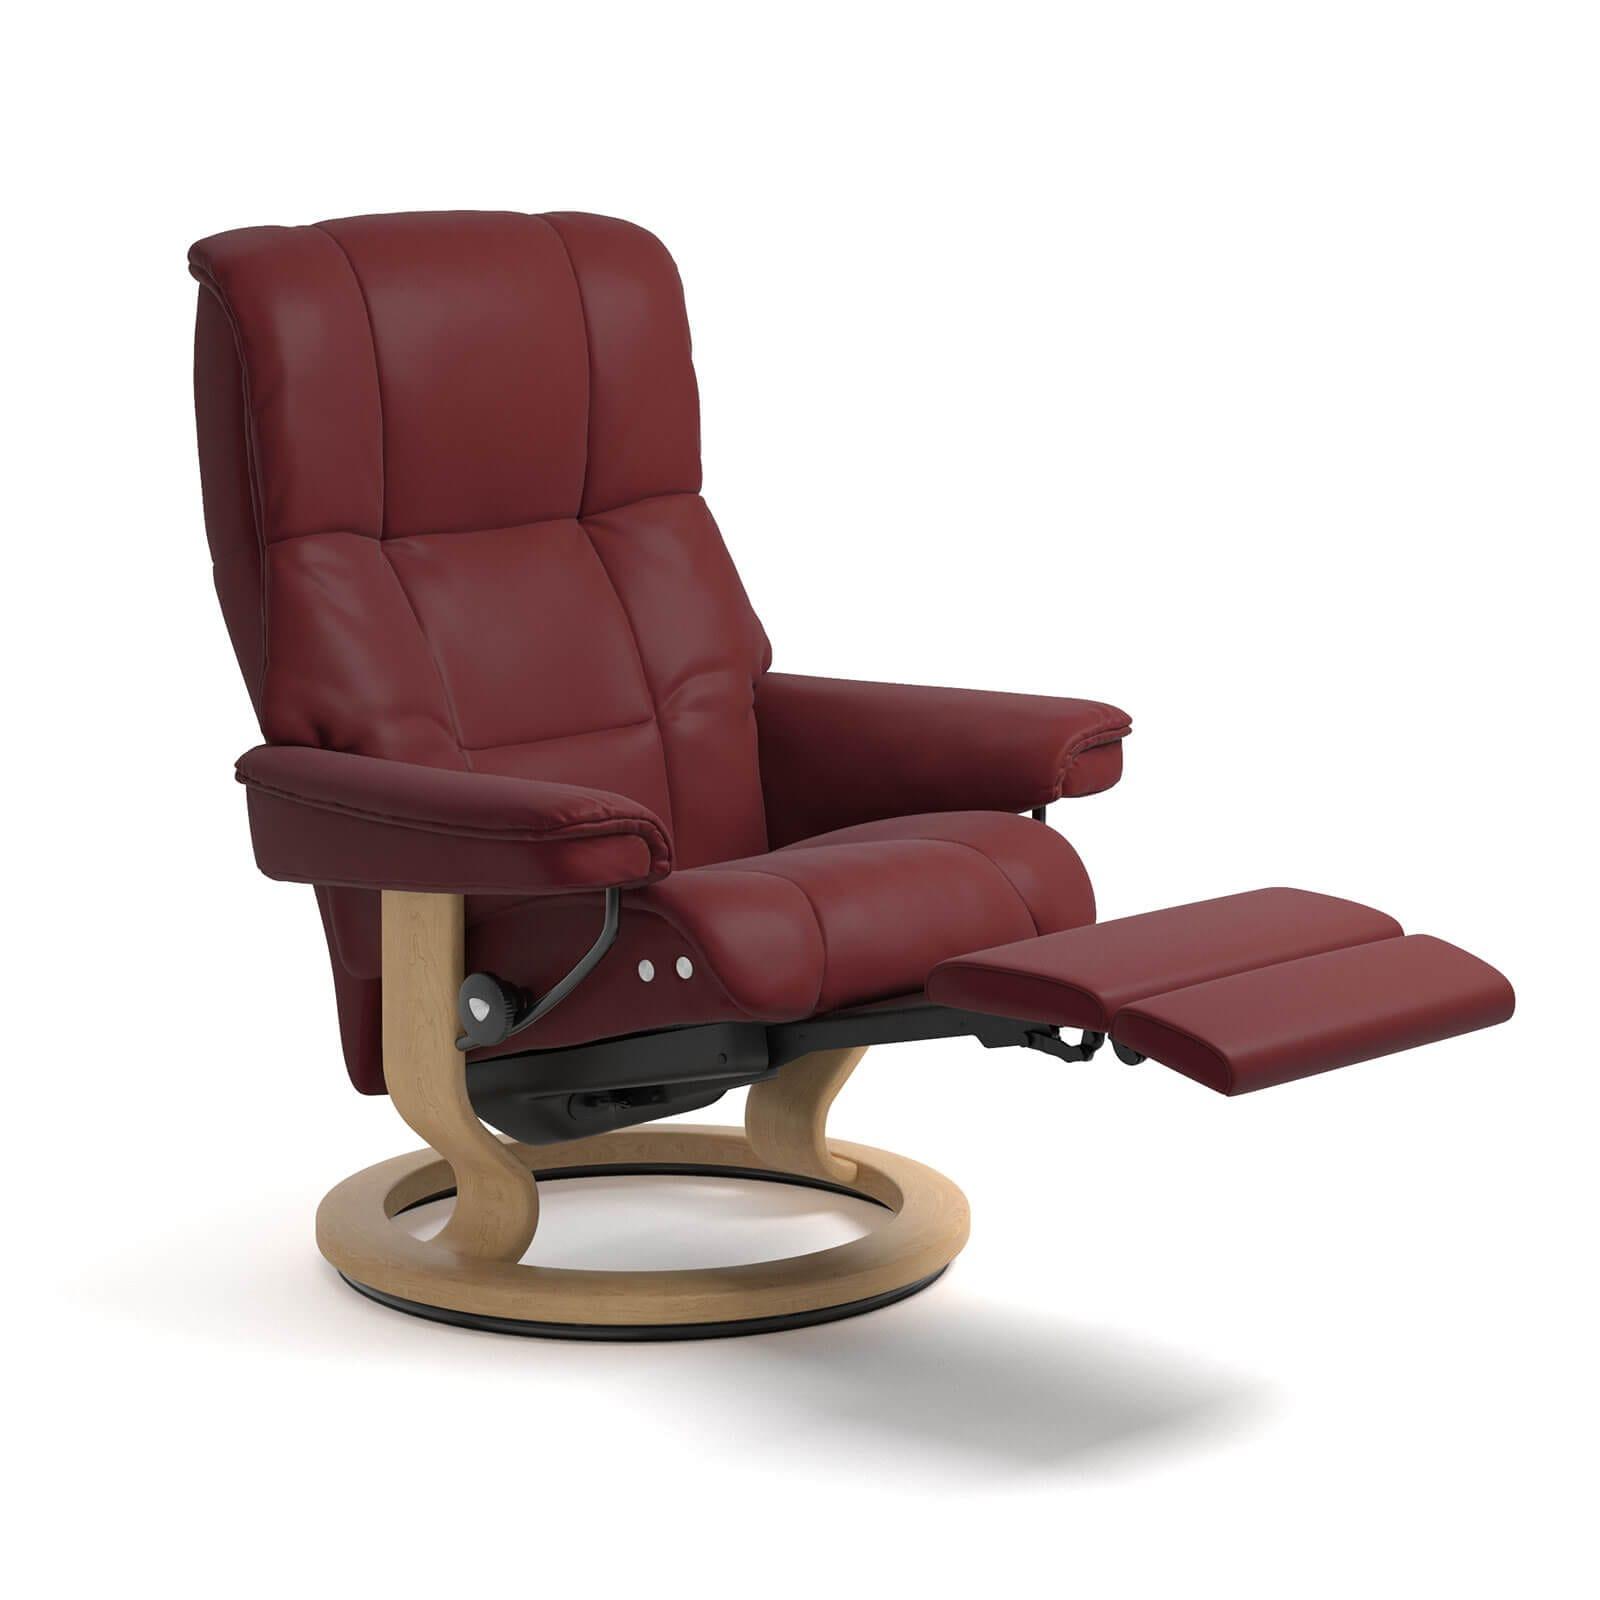 stressless mayfair legcomfort burgundy gestell natur. Black Bedroom Furniture Sets. Home Design Ideas